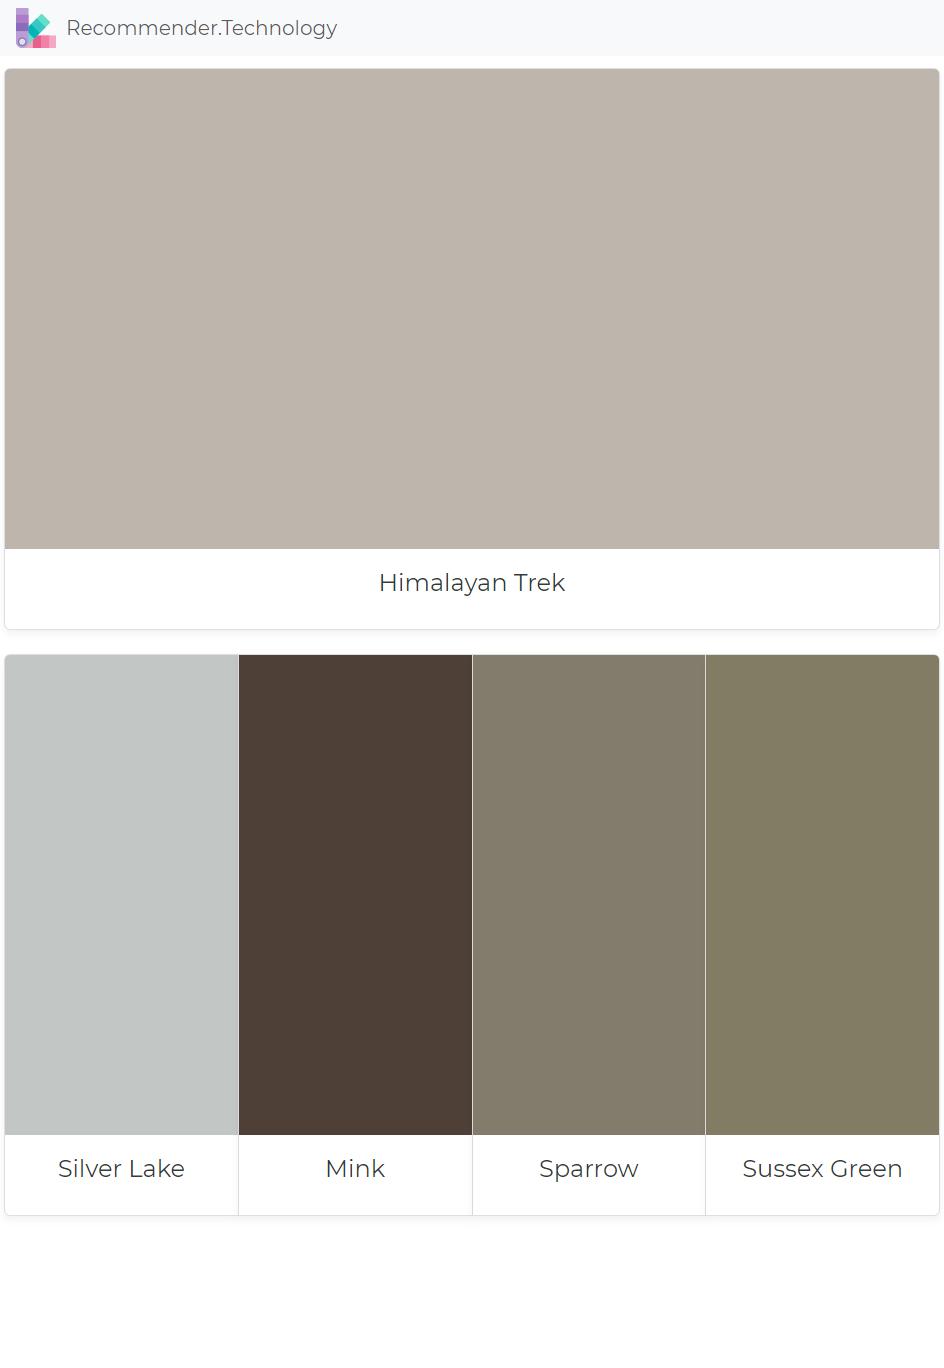 Himalayan Trek Silver Lake Mink Sparrow Sussex Green House Color Schemes Grey Exterior Paint Colors Benjamin Moore